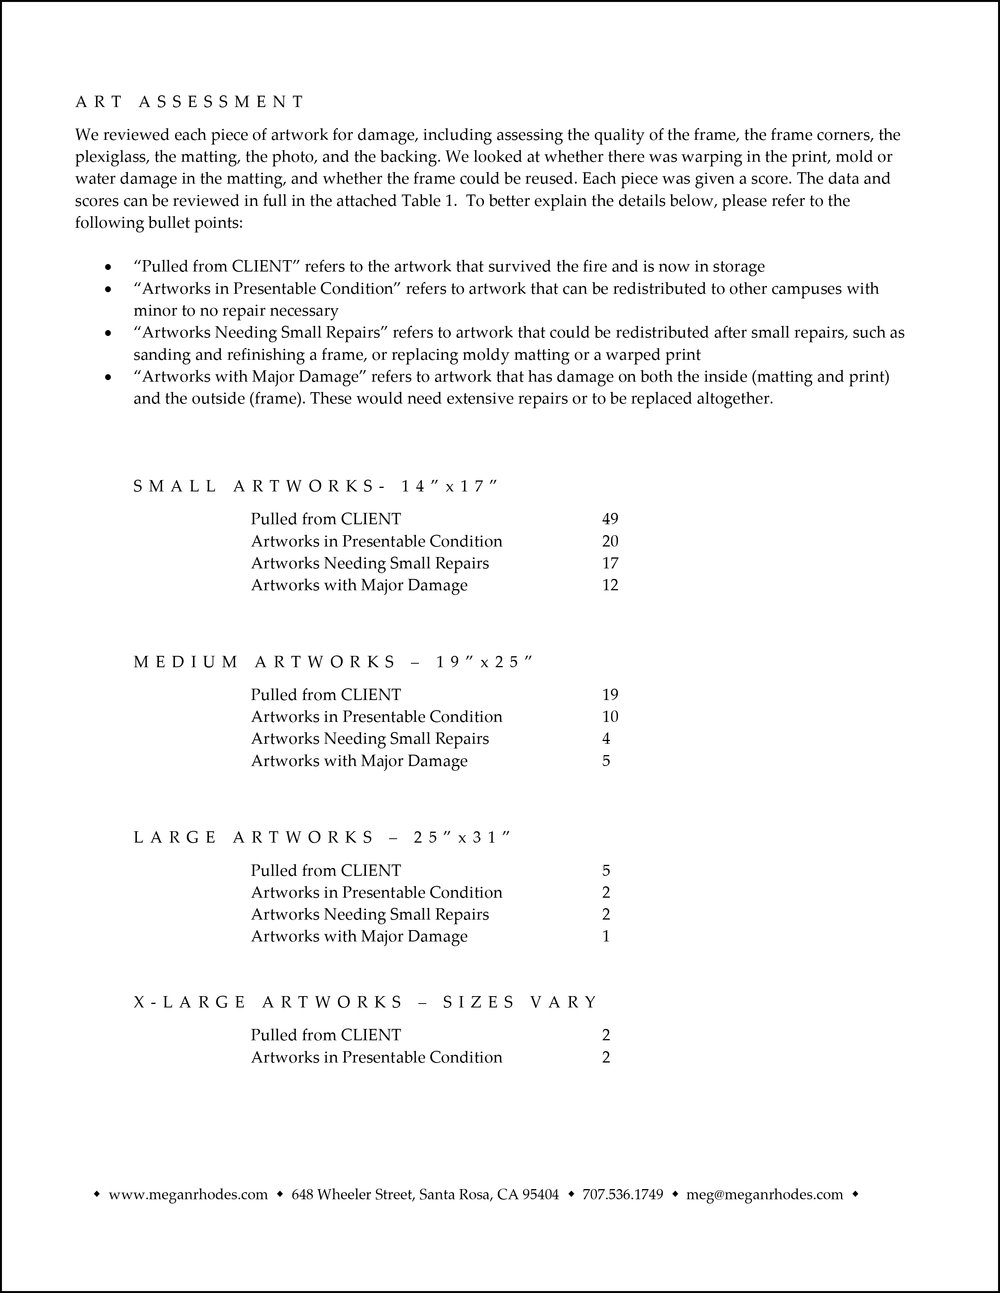 Writing Sample - Corporate Fire Assessment-2.jpg